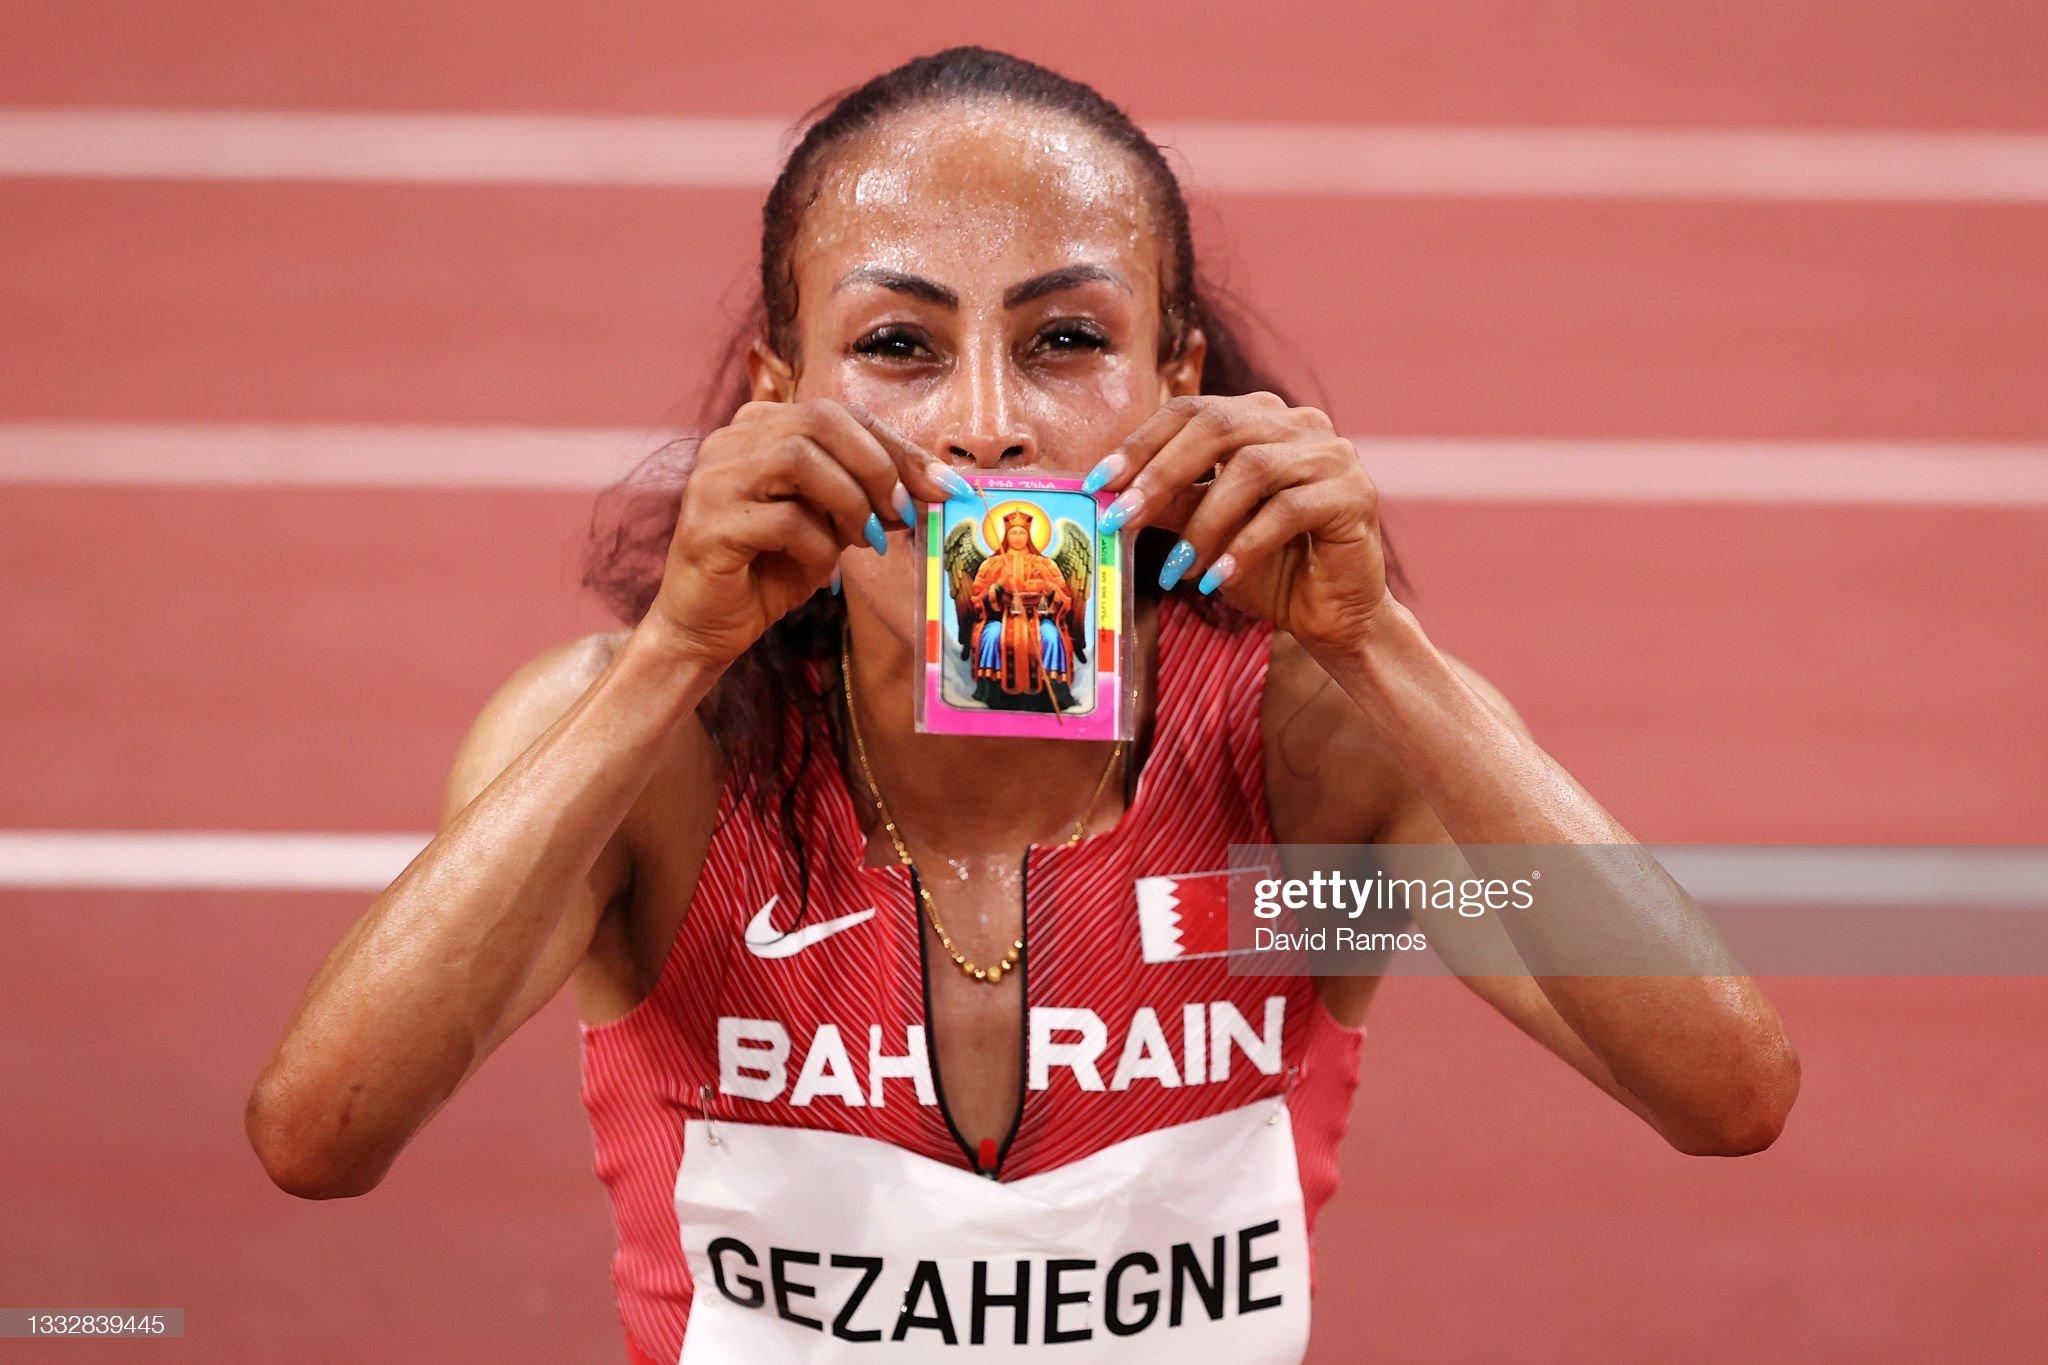 RELIGION: ¿Eres creyente?  Kalkidan-gezahegne-of-team-bahrain-celebrates-as-she-wins-the-silver-picture-id1332839445?s=2048x2048